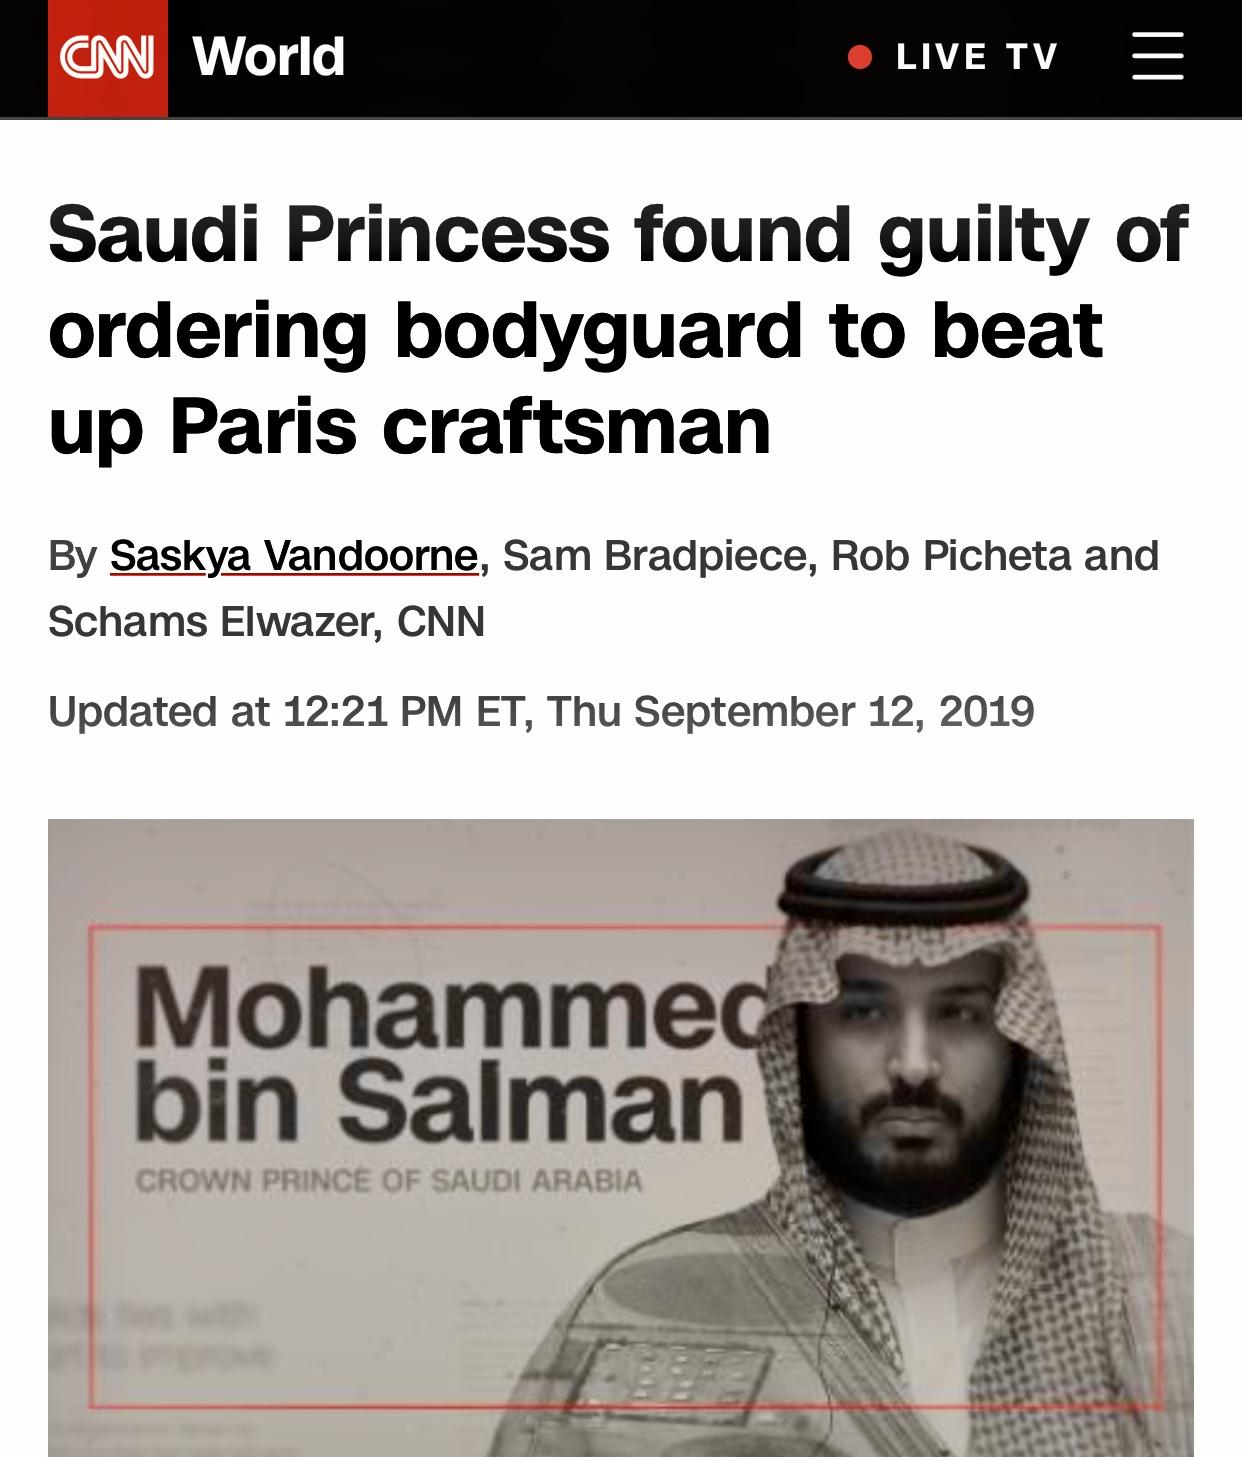 Princess Hassa bint Salman Al Saud found guilty of ordering her bodyguard to beat up a craftsman in Paris